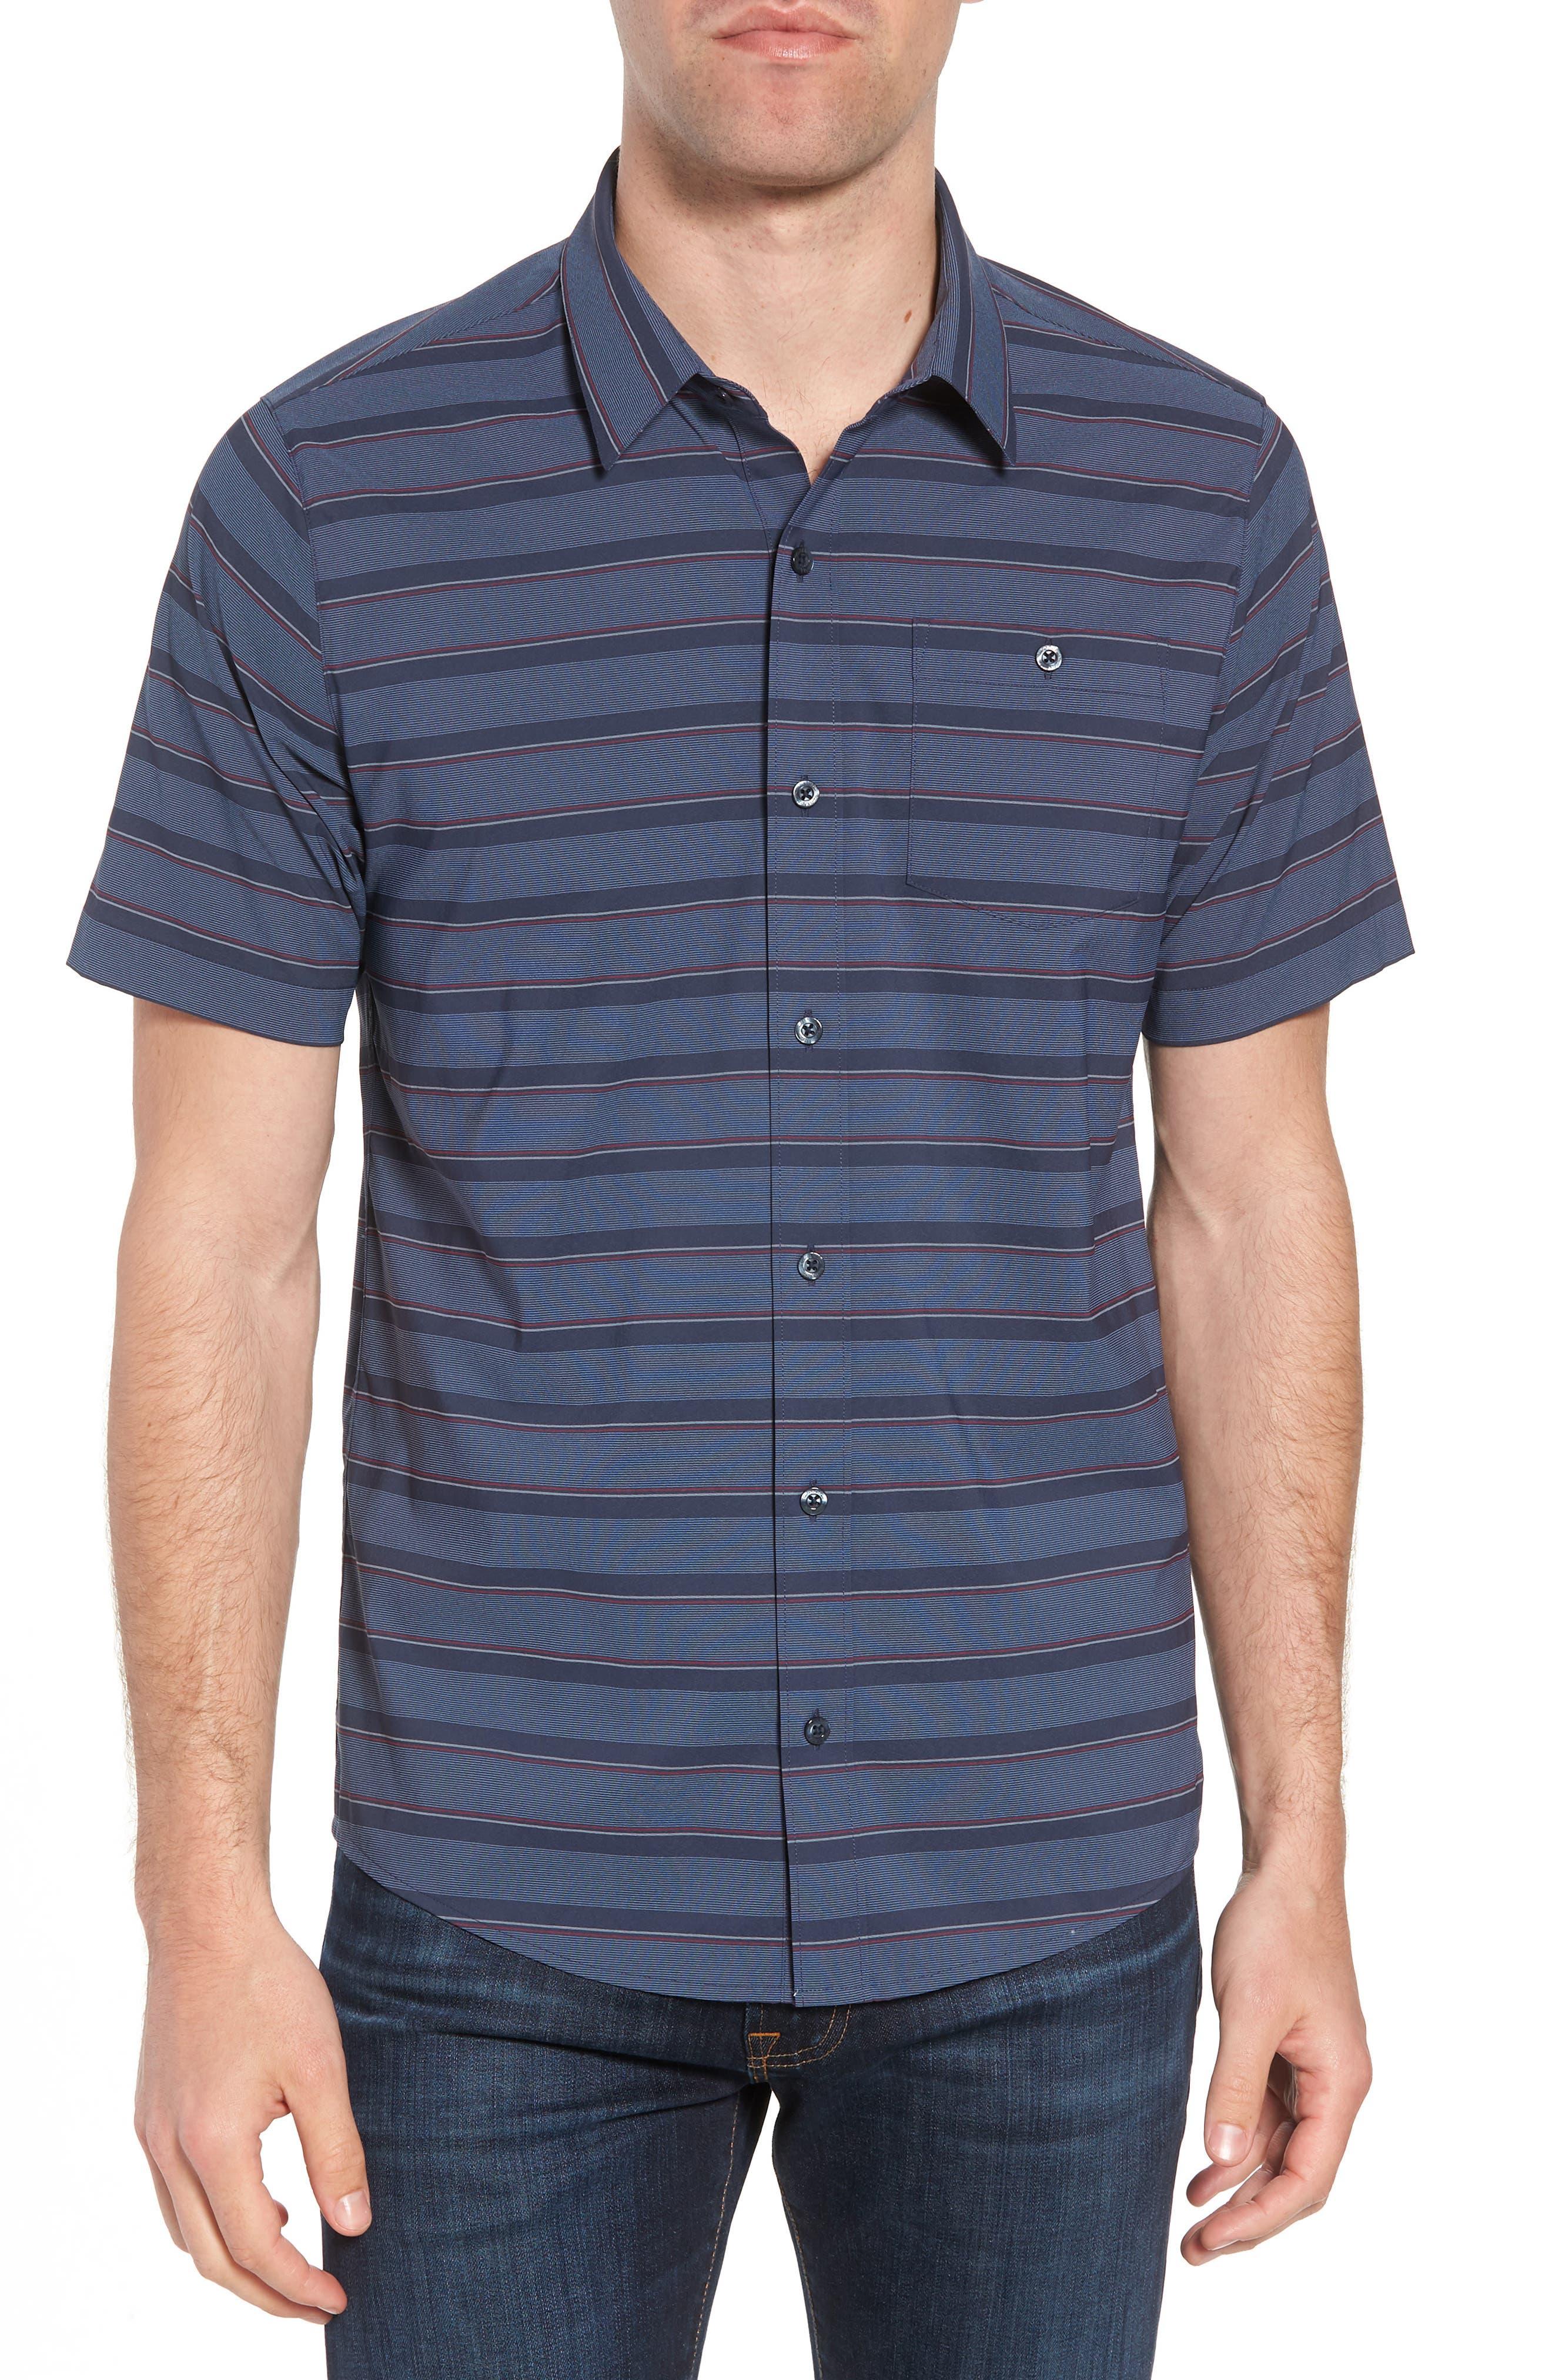 Quiver Regular Fit Sport Shirt,                             Main thumbnail 1, color,                             400